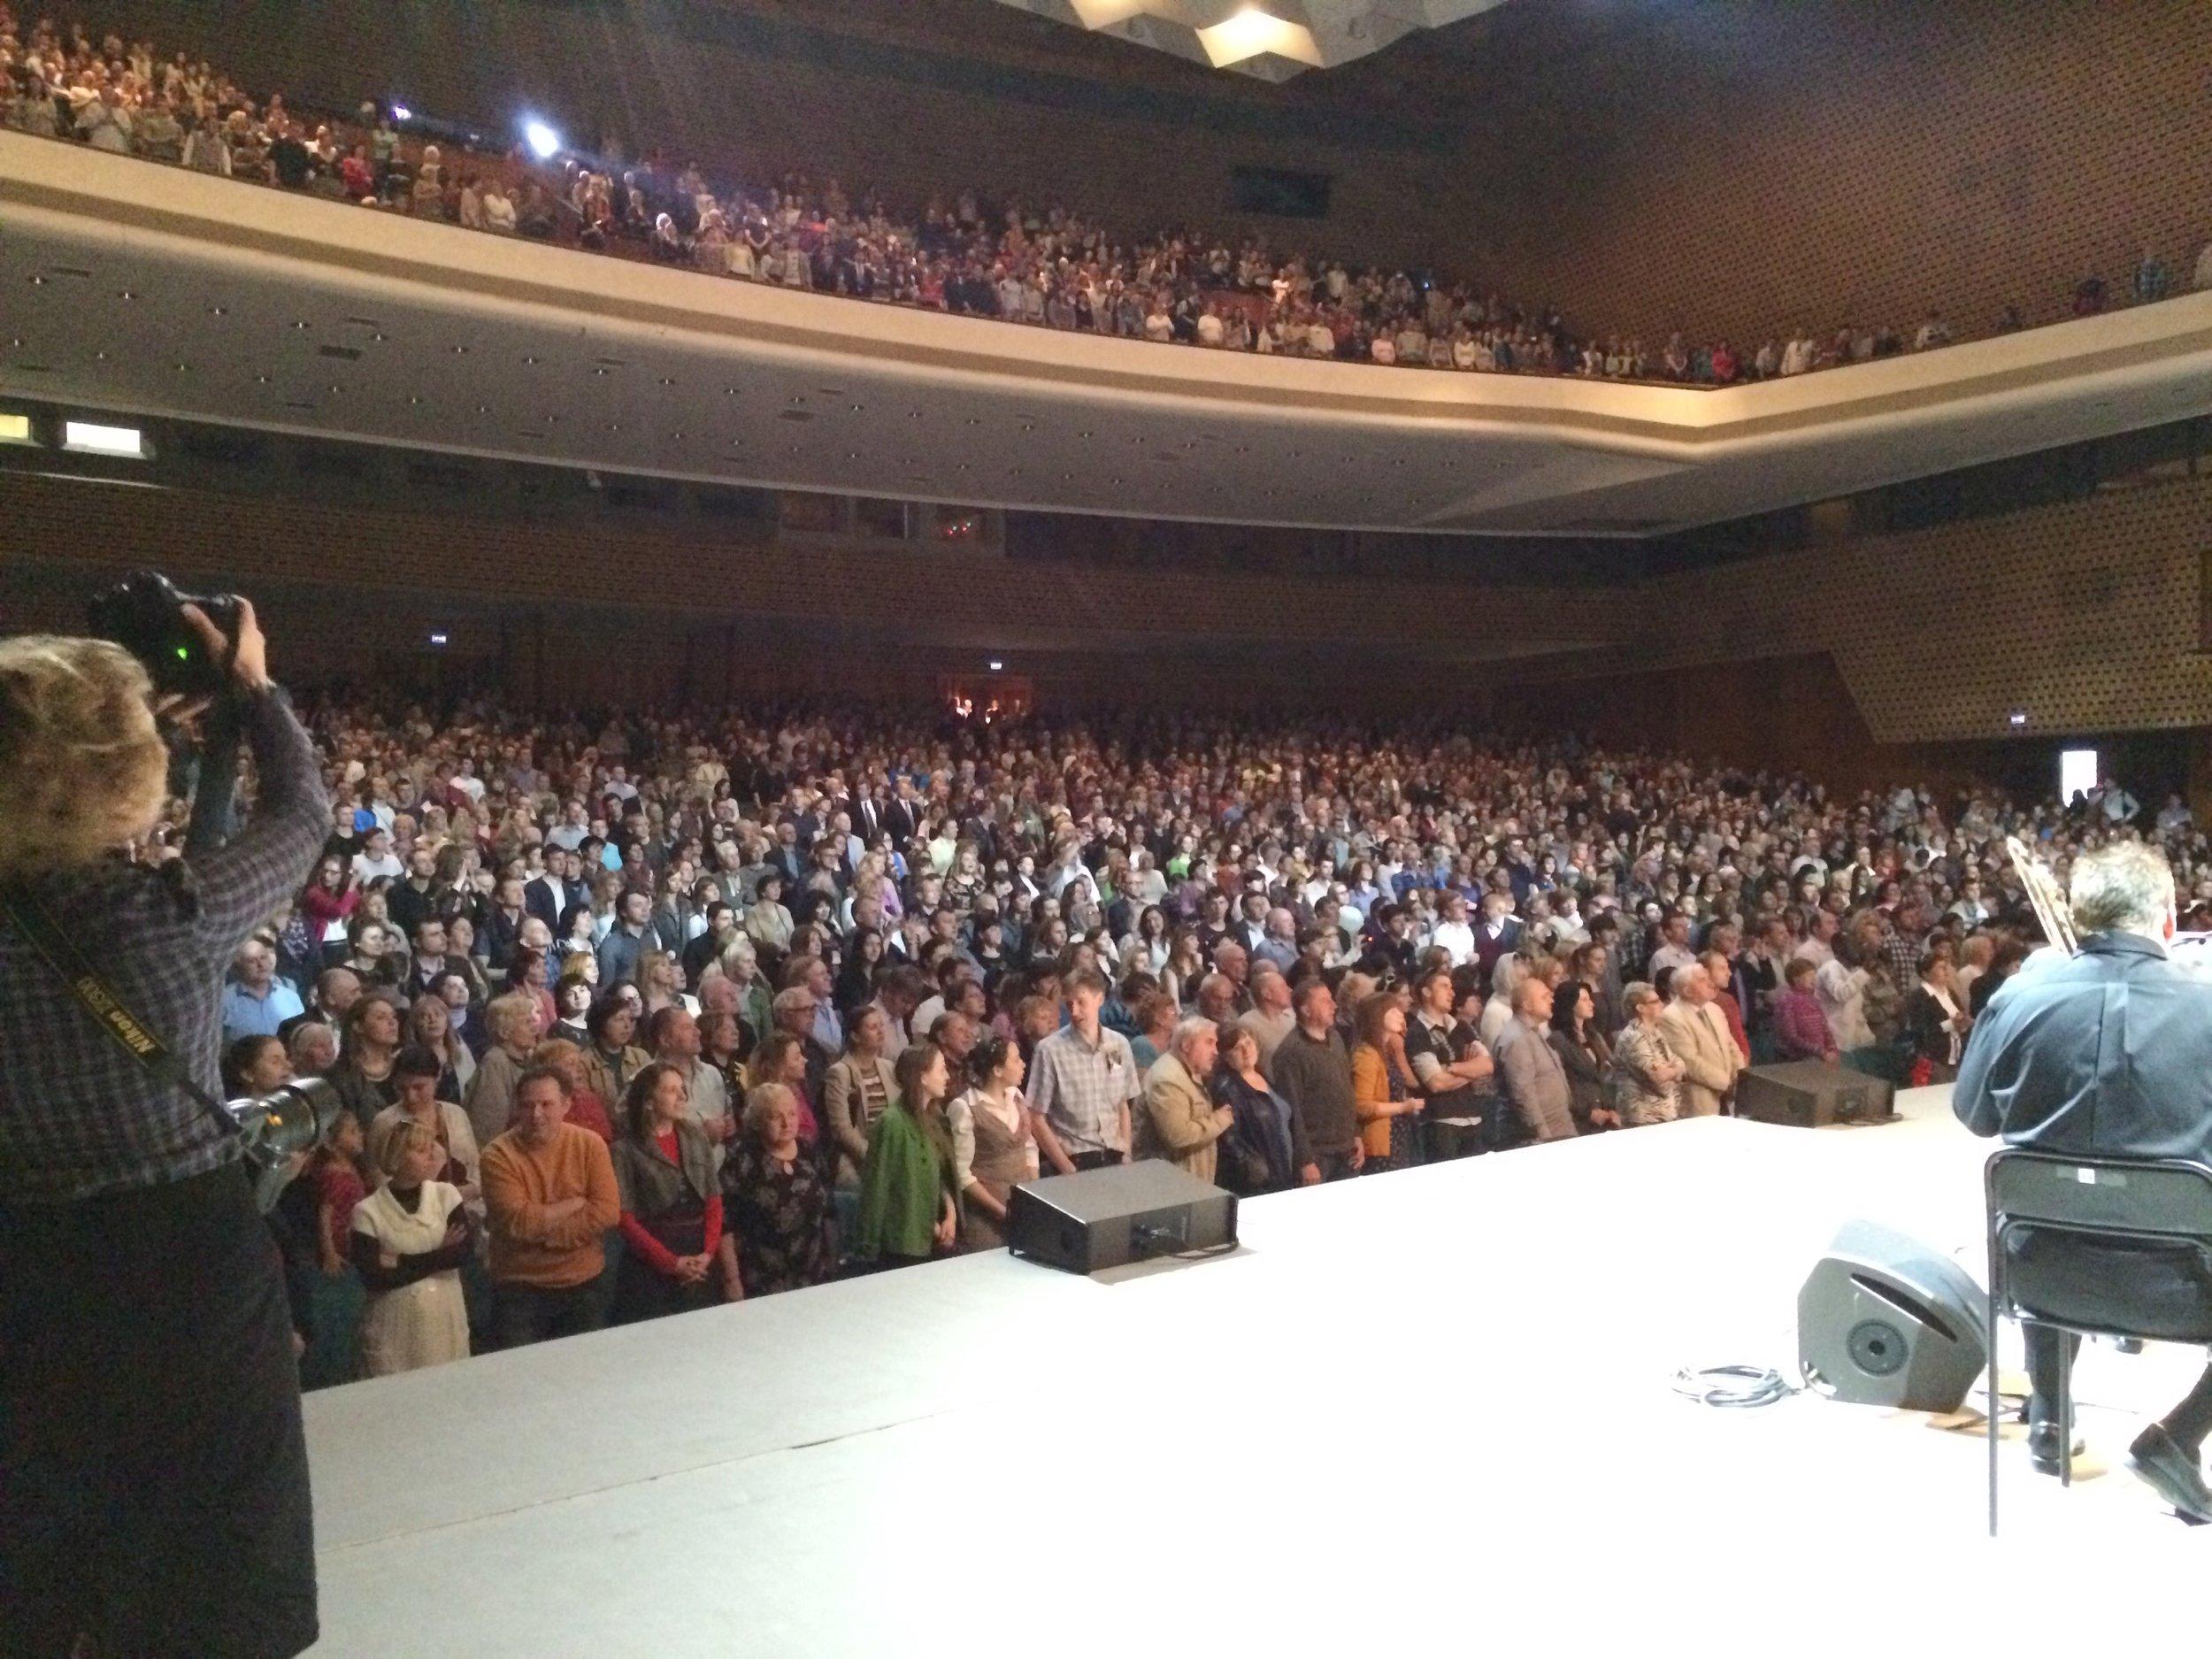 Kiev Performance Hall